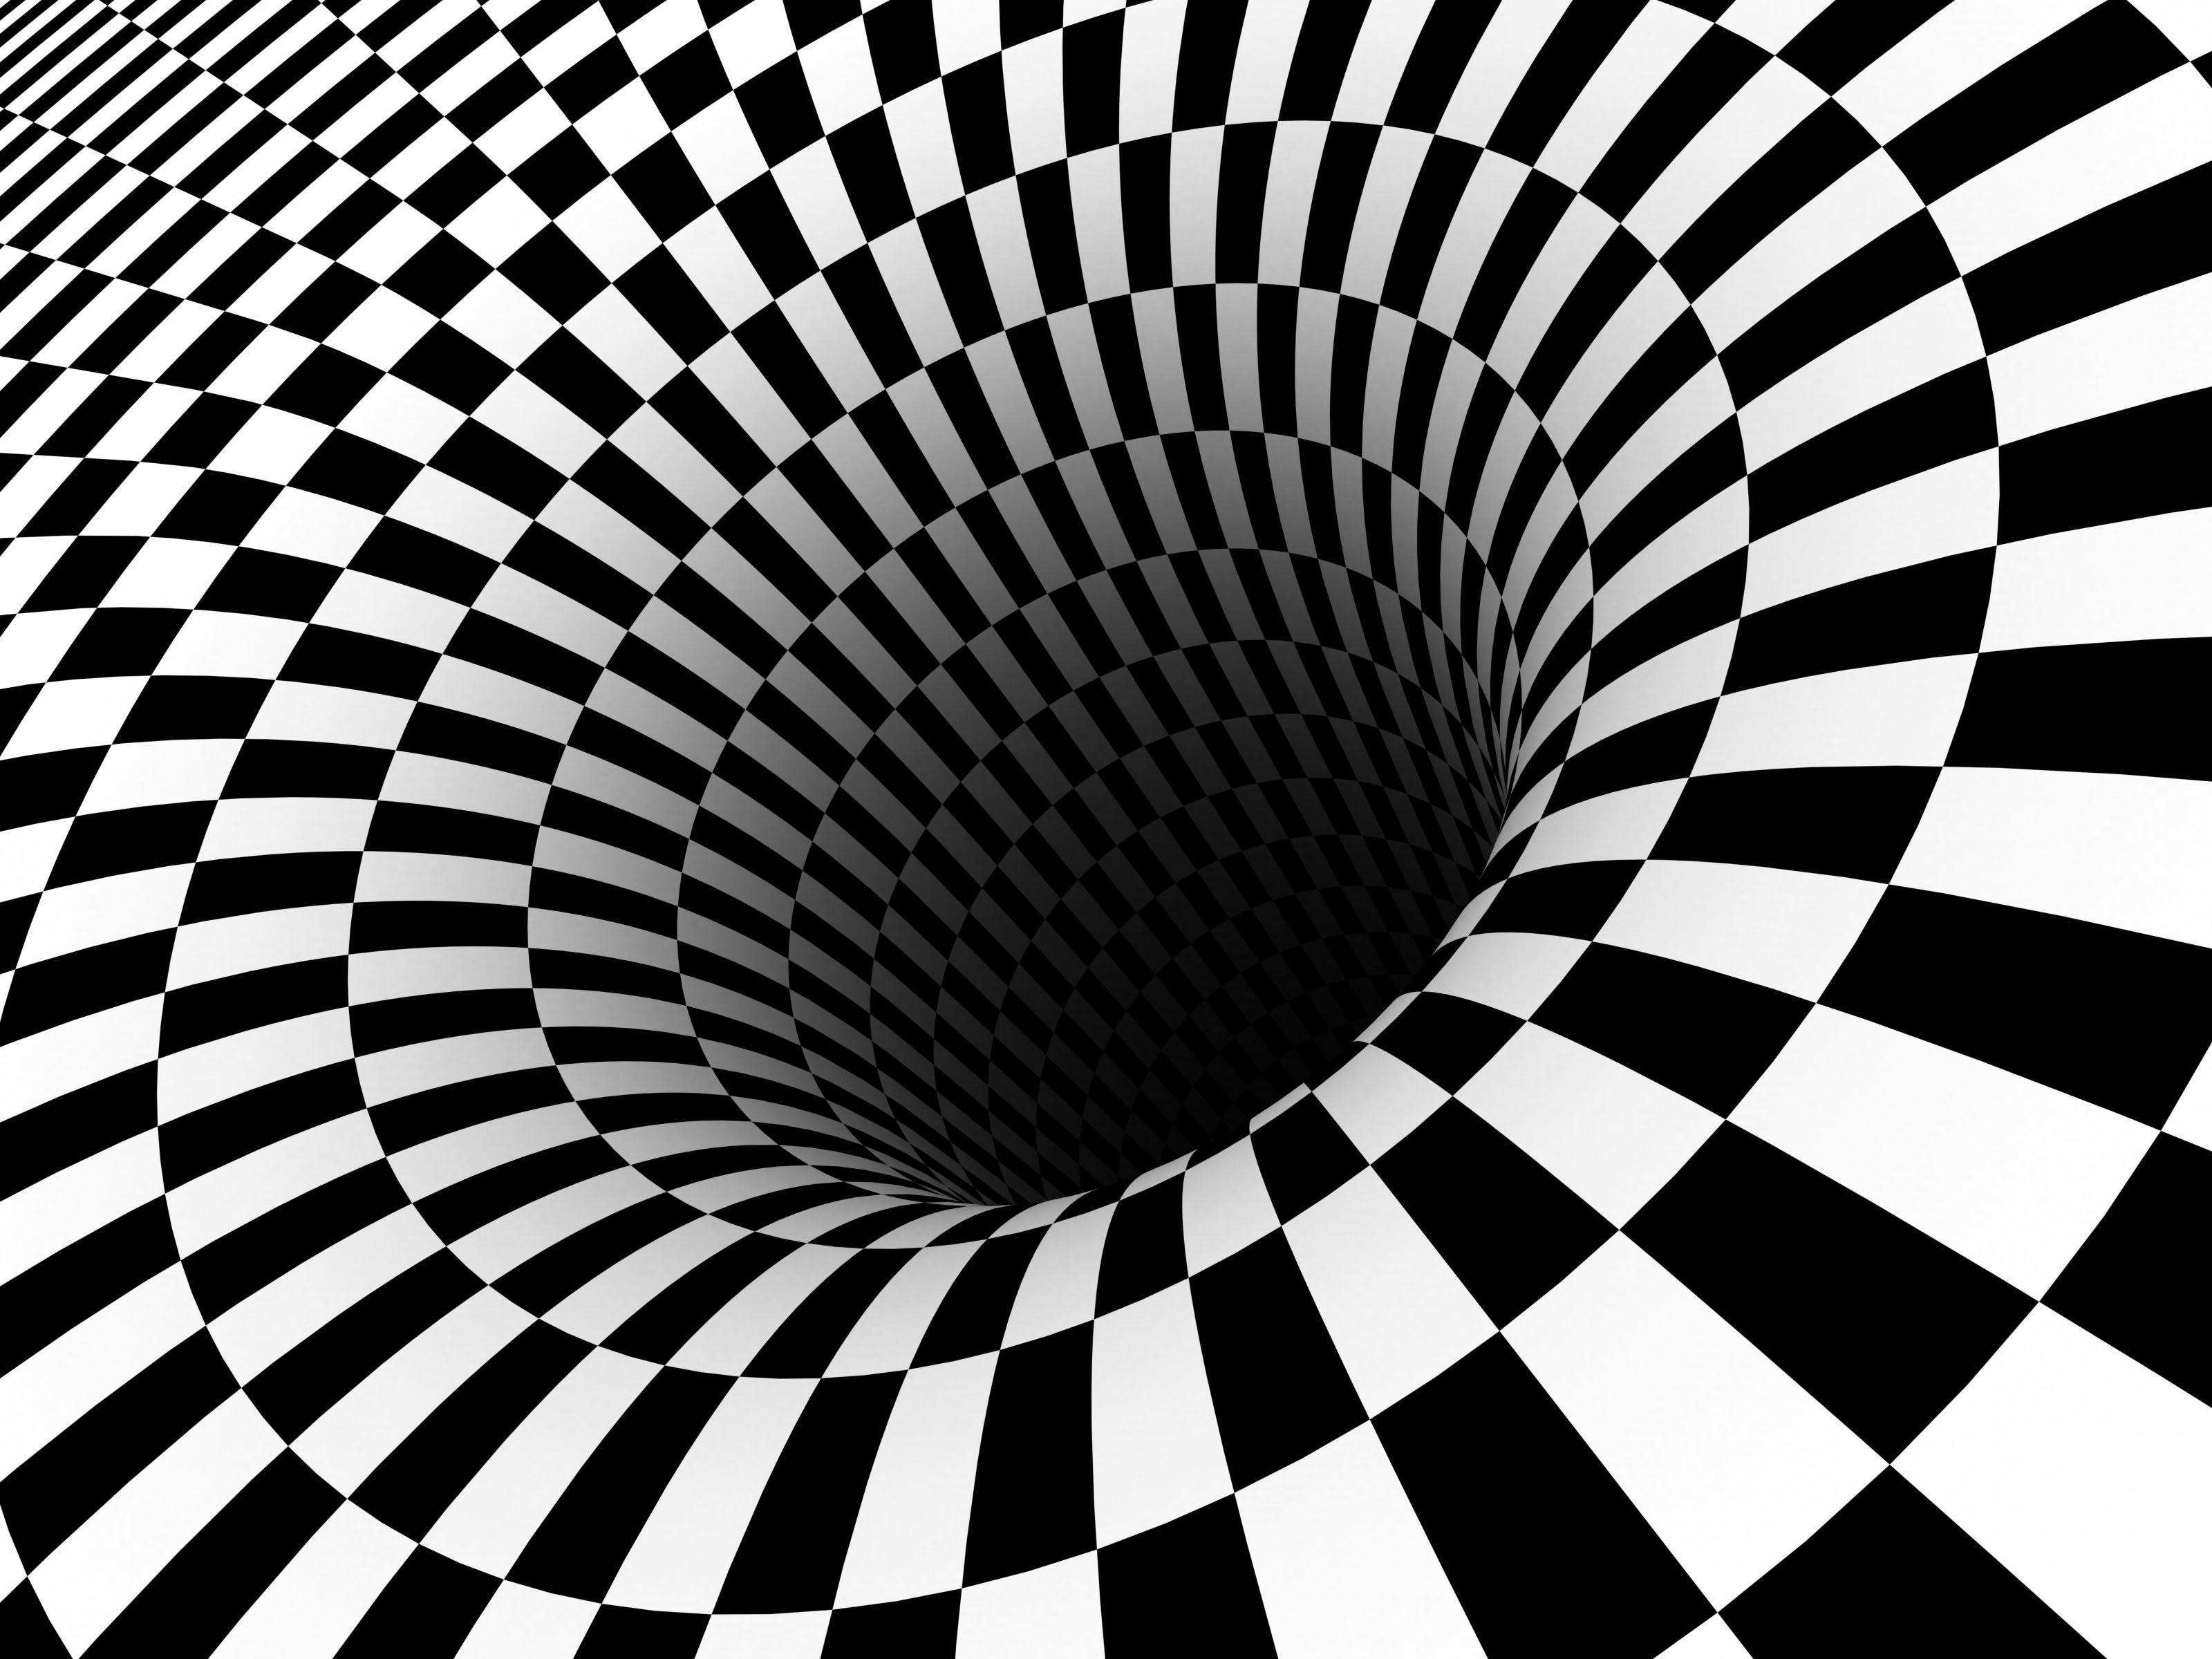 Illusion Wallpaper Hotcelebwallpaperz Illusion Wallpaper